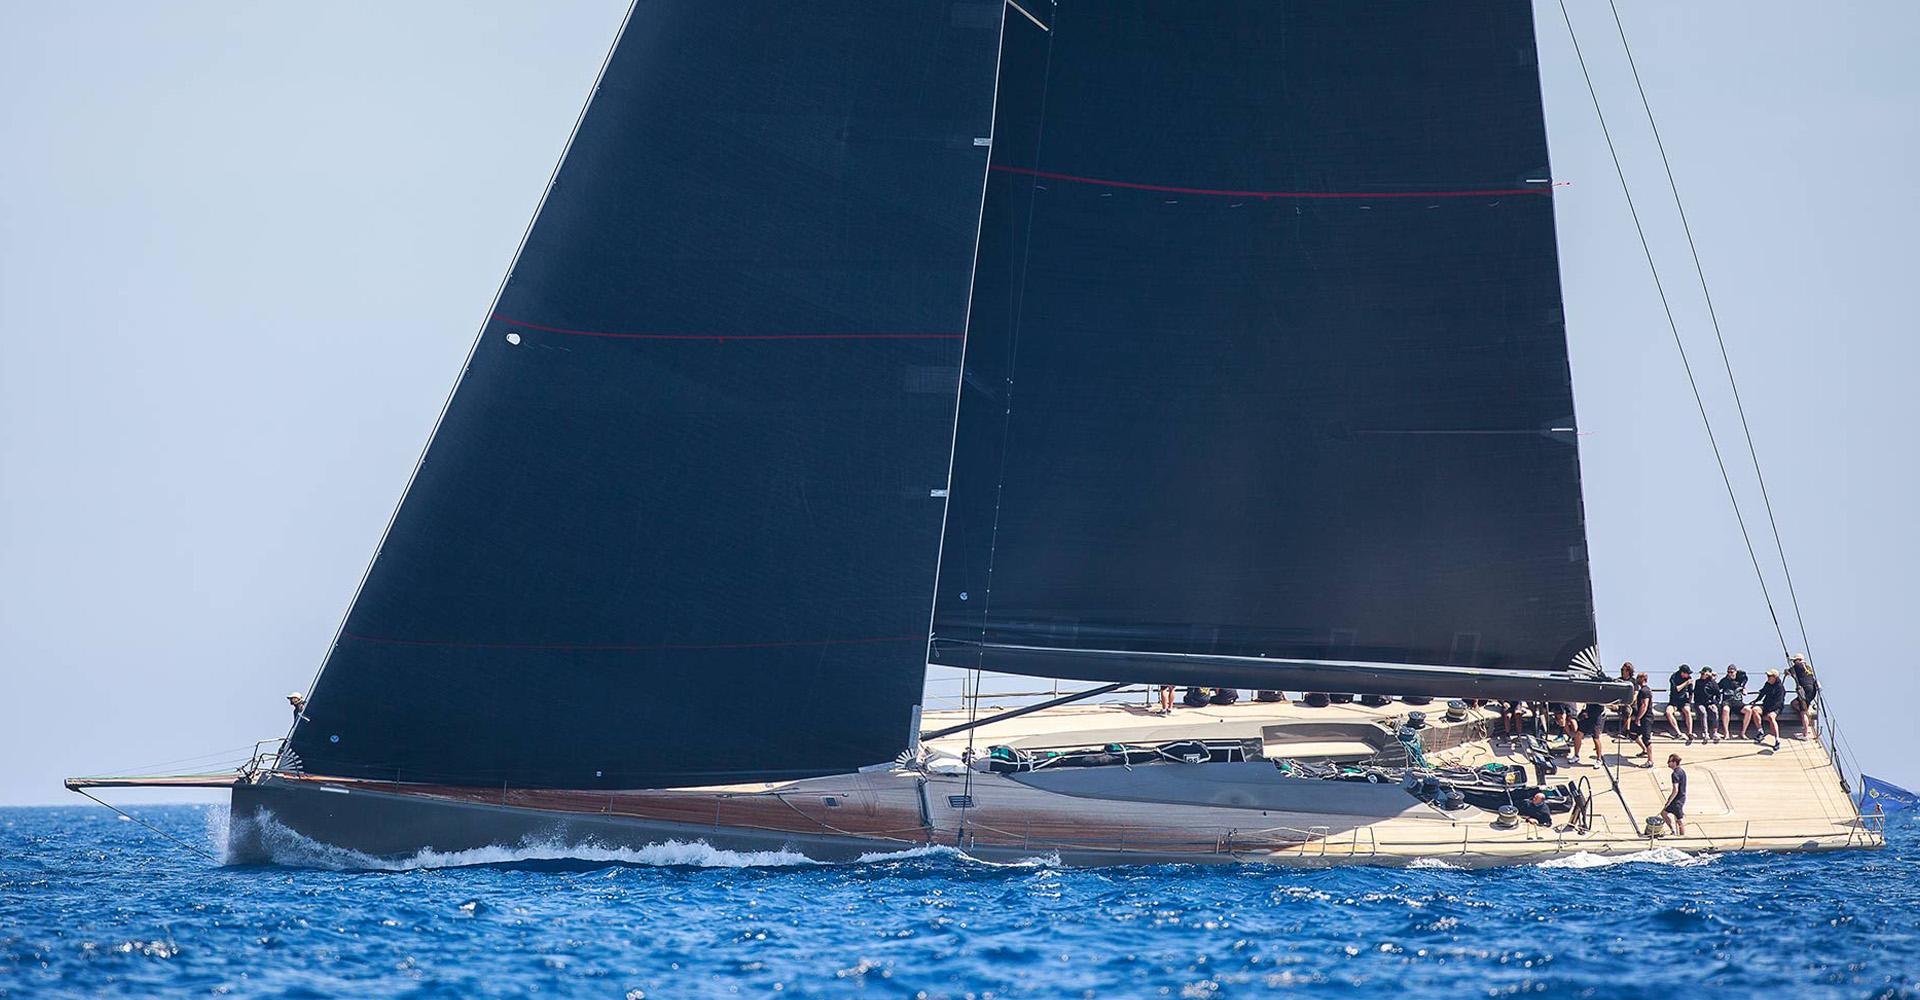 Sailing yacht open season underway